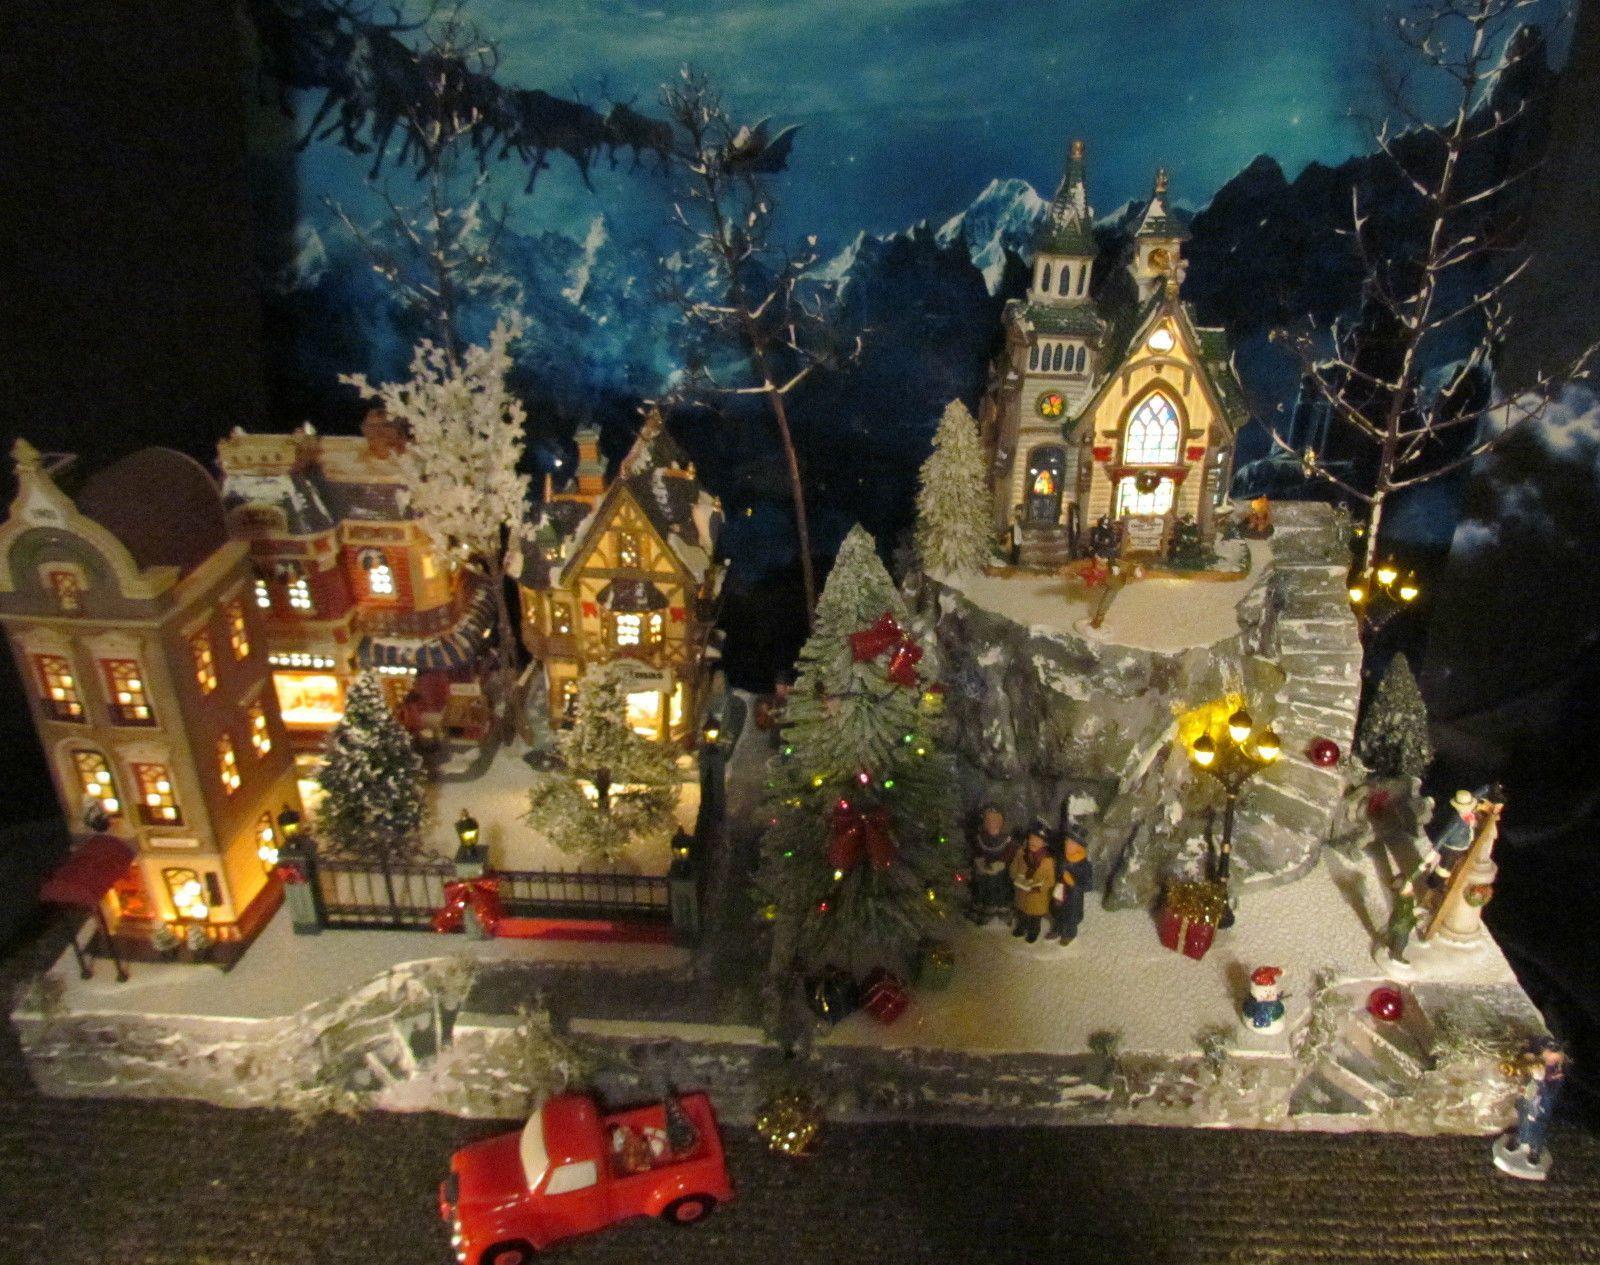 Christmas Village Display Platforms.Diy Christmas Village Display Platforms Christmas Diy